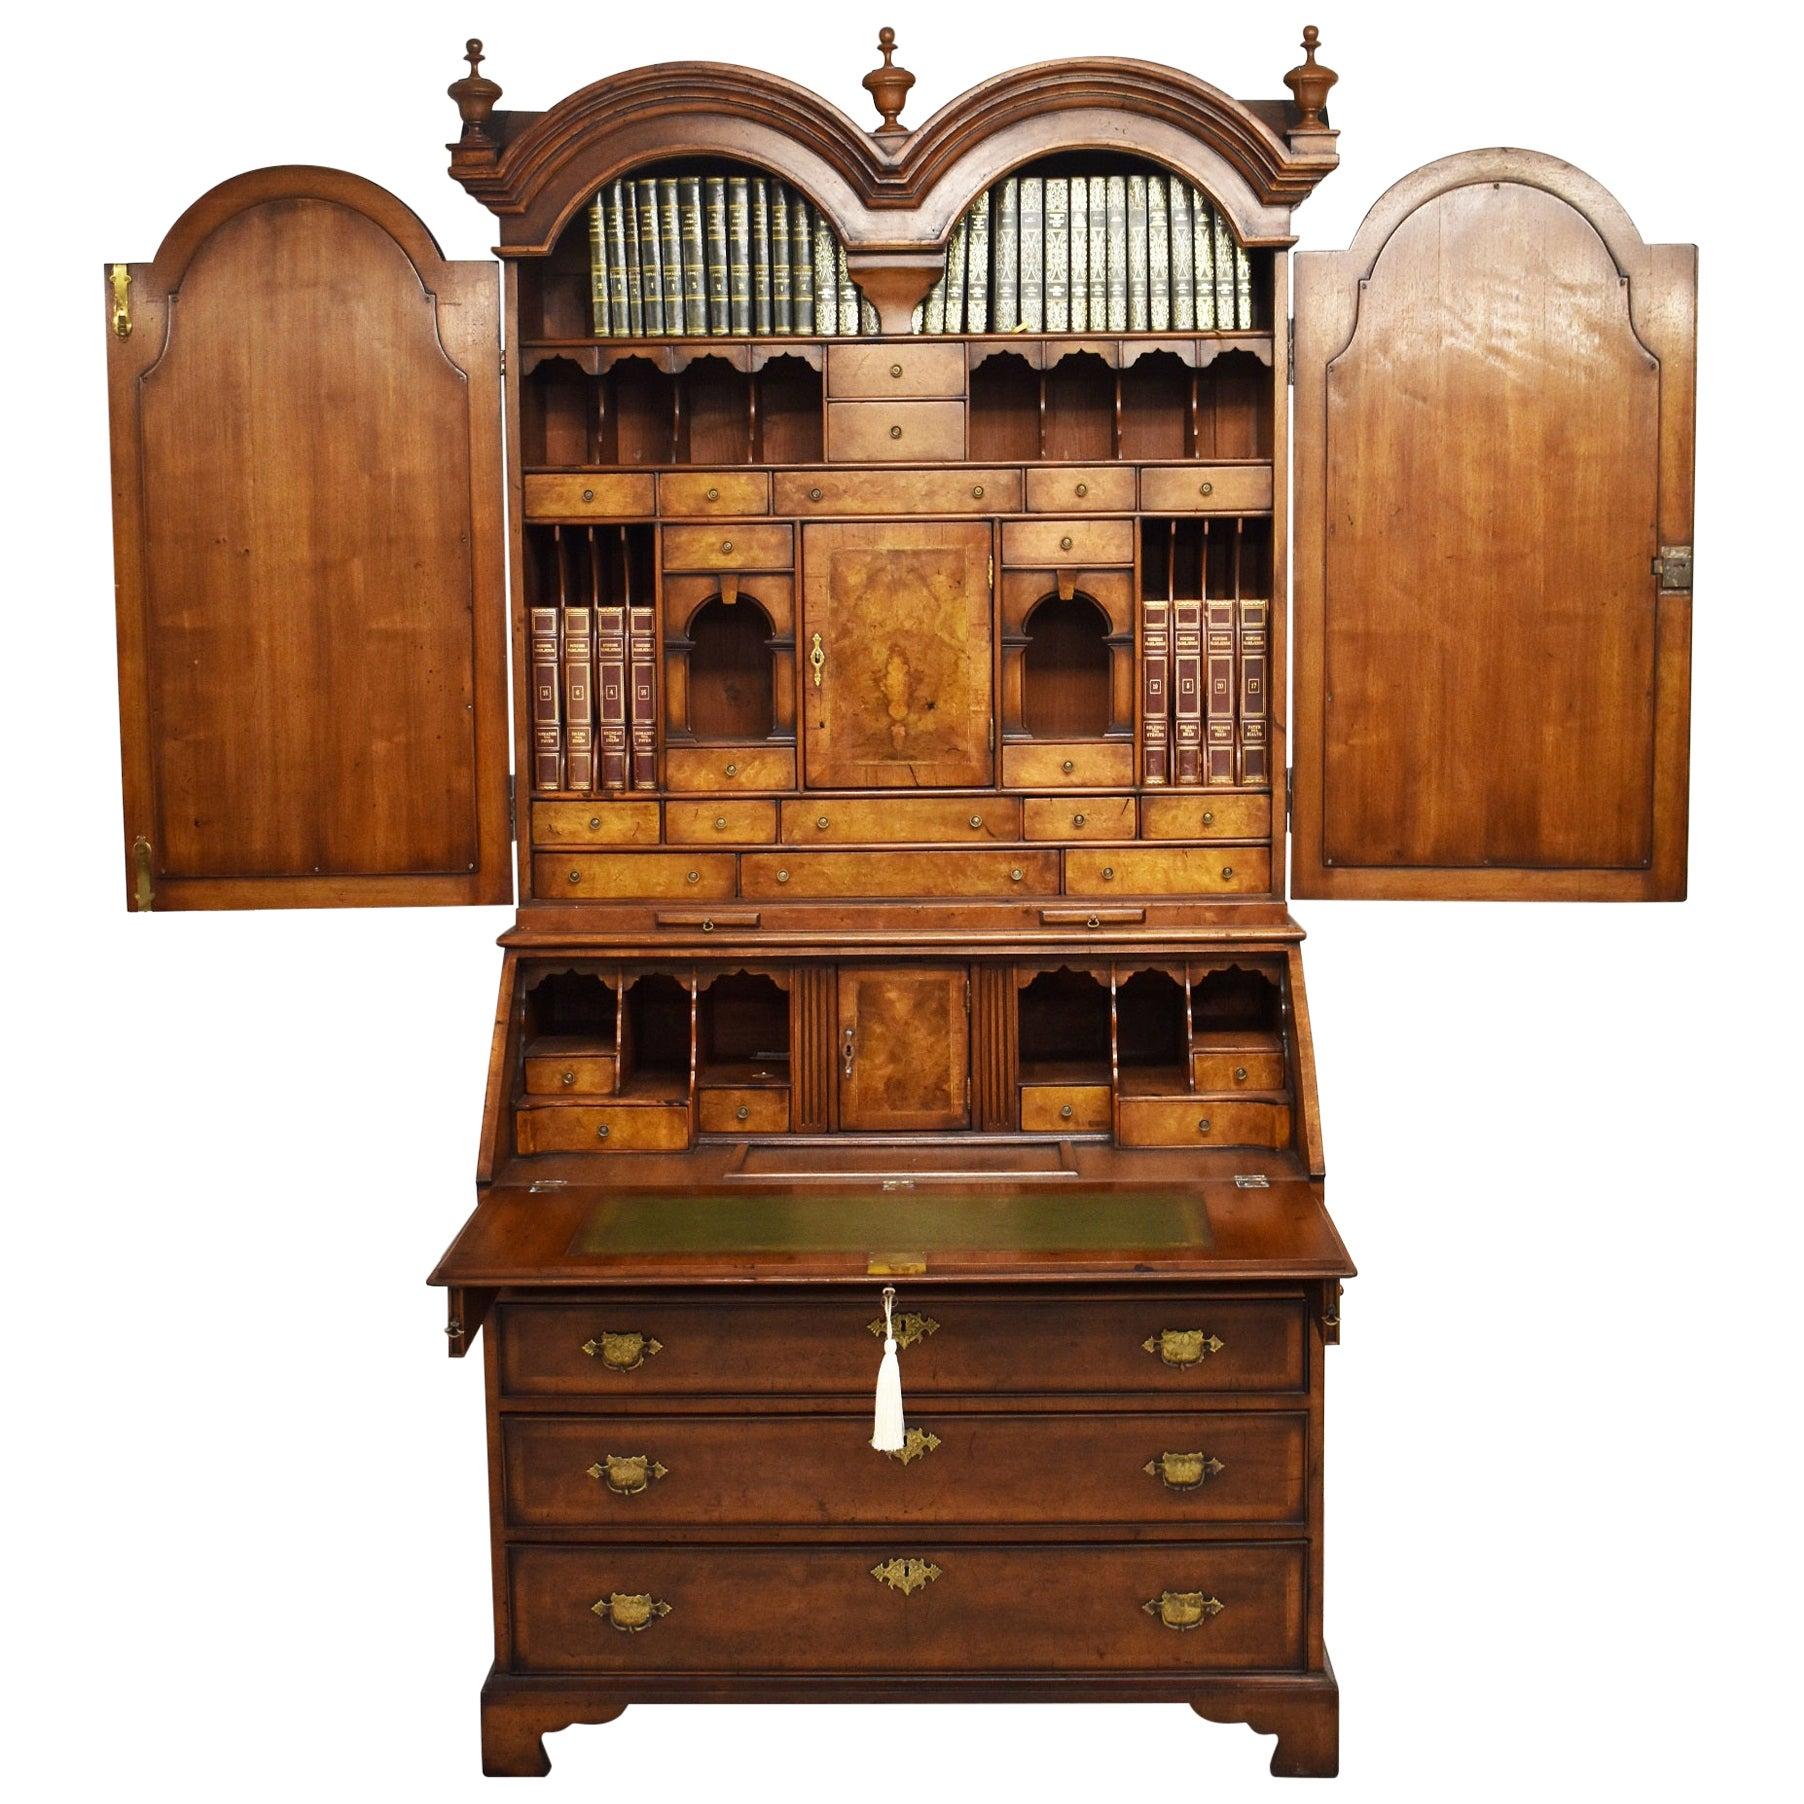 19th Century English George III Burr Walnut Bureau Bookcase